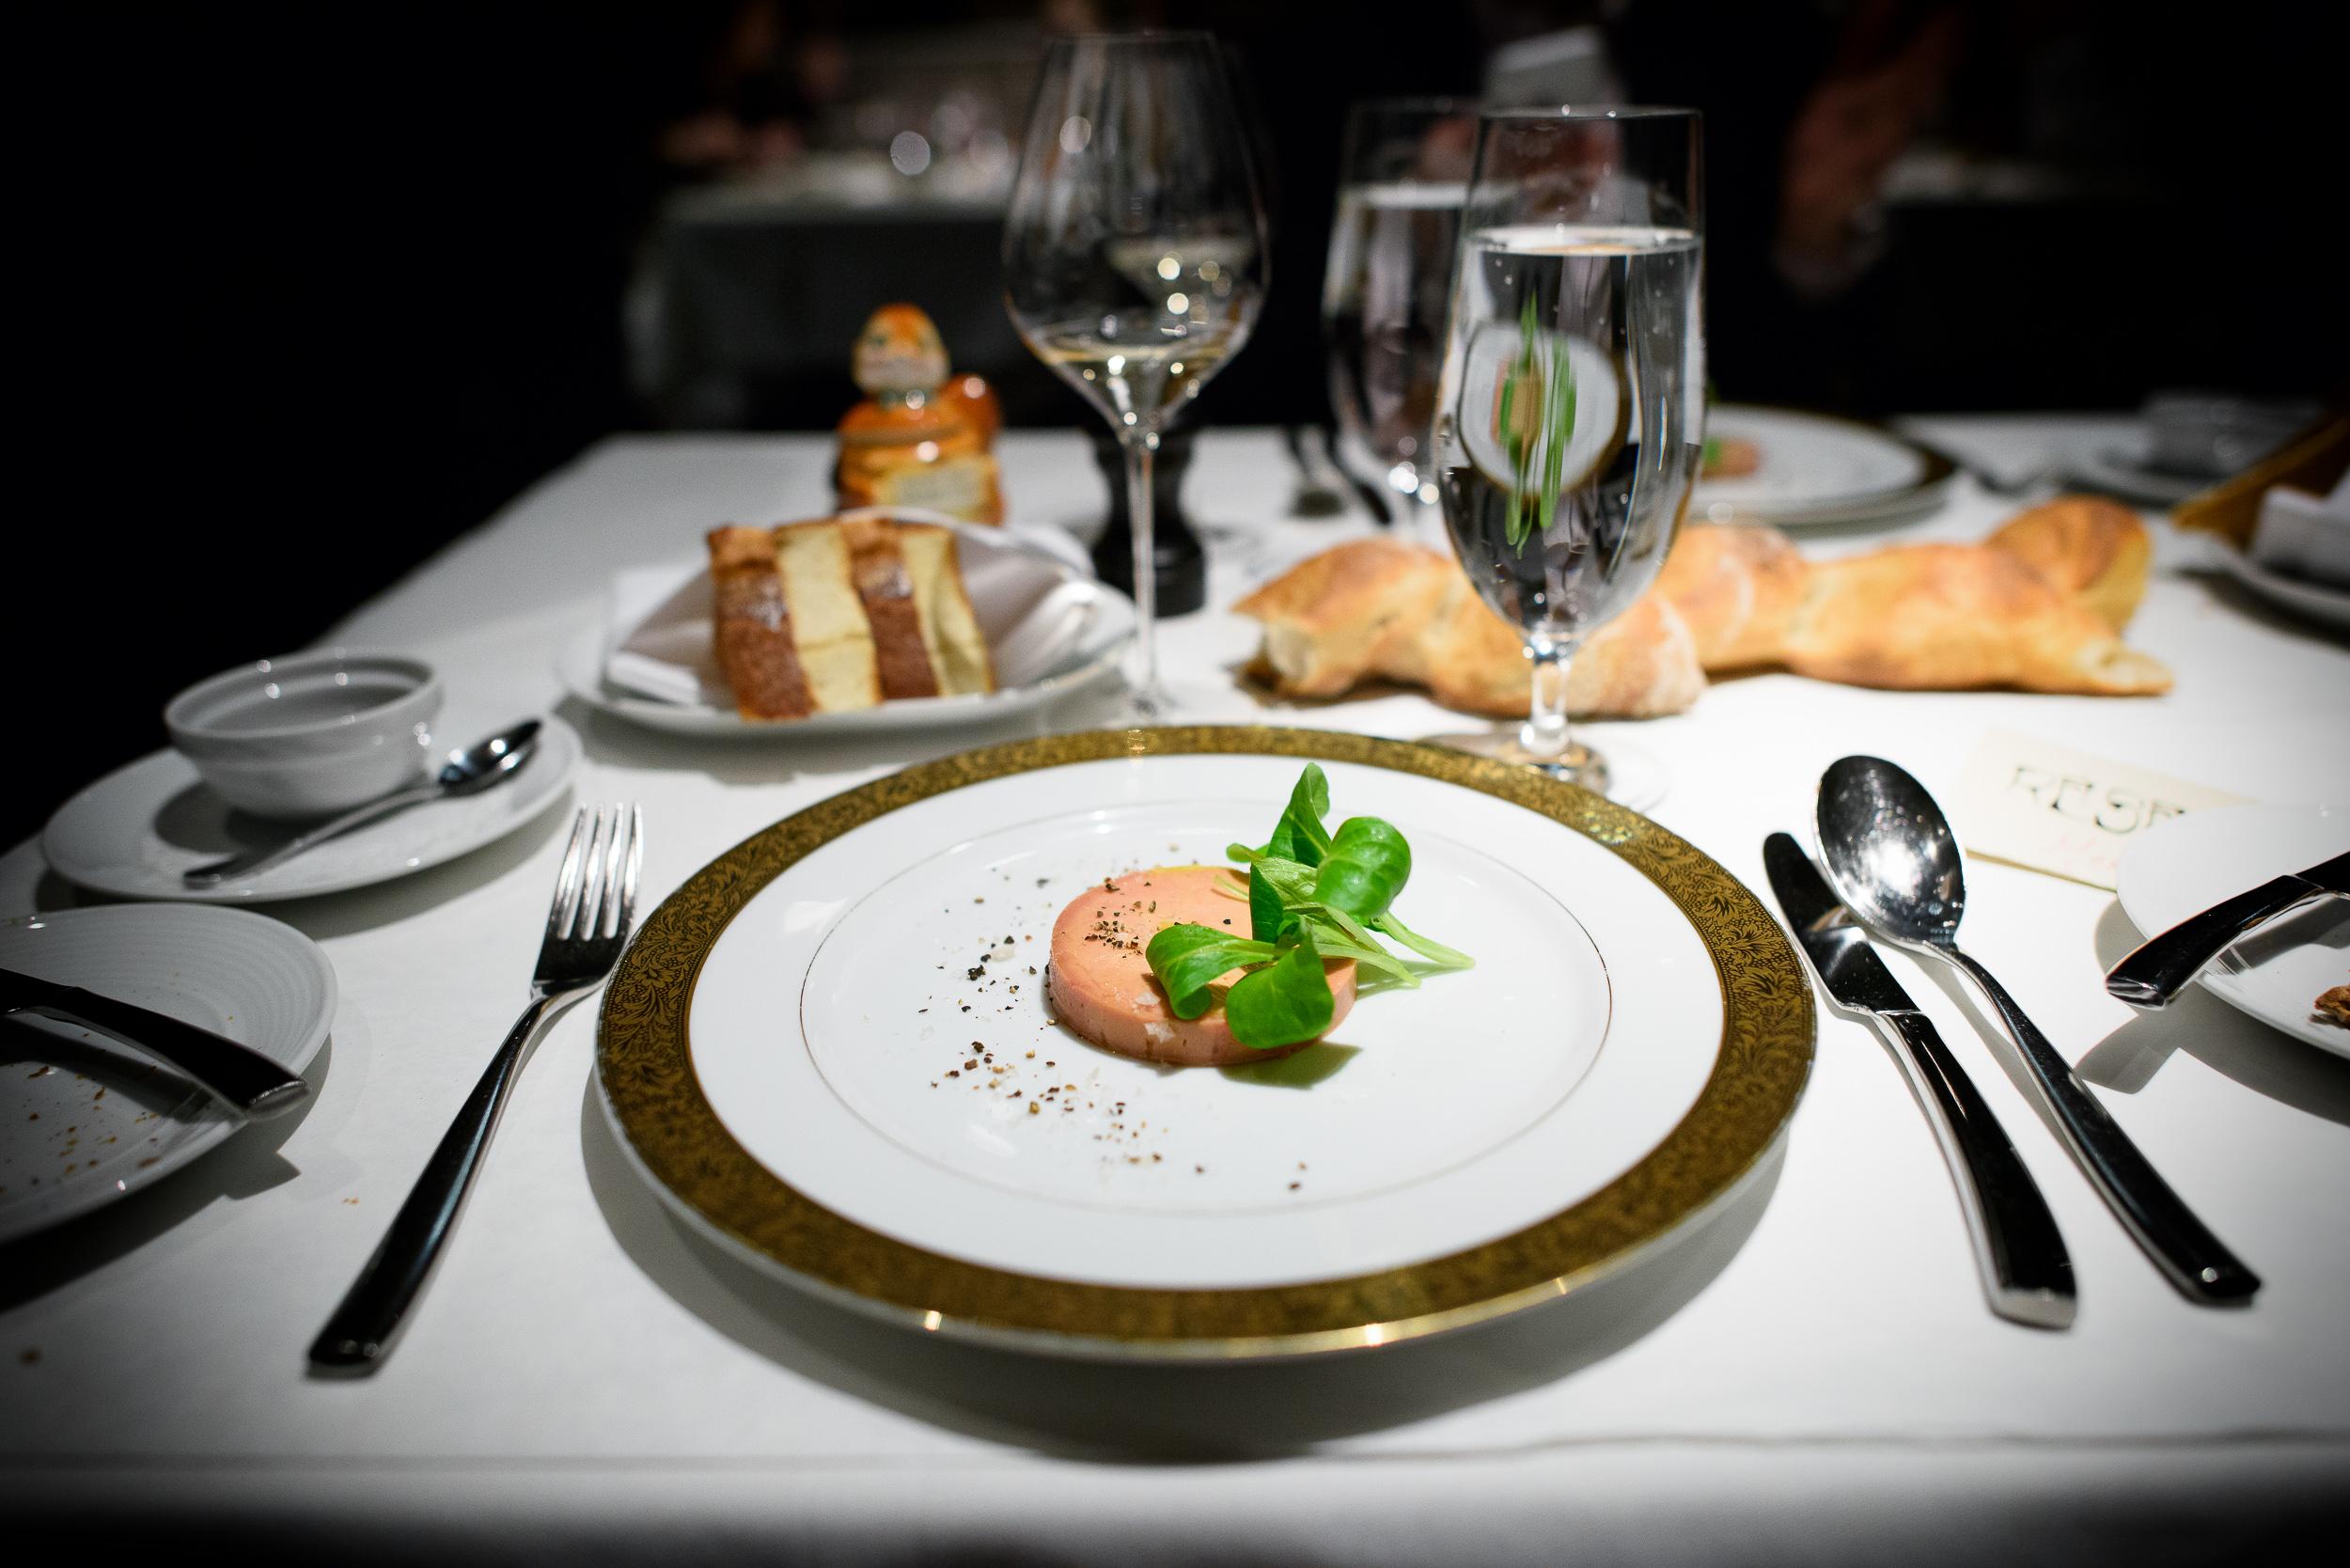 3rd Course: Foie gras au Torchon, foie gras with brioche toast p